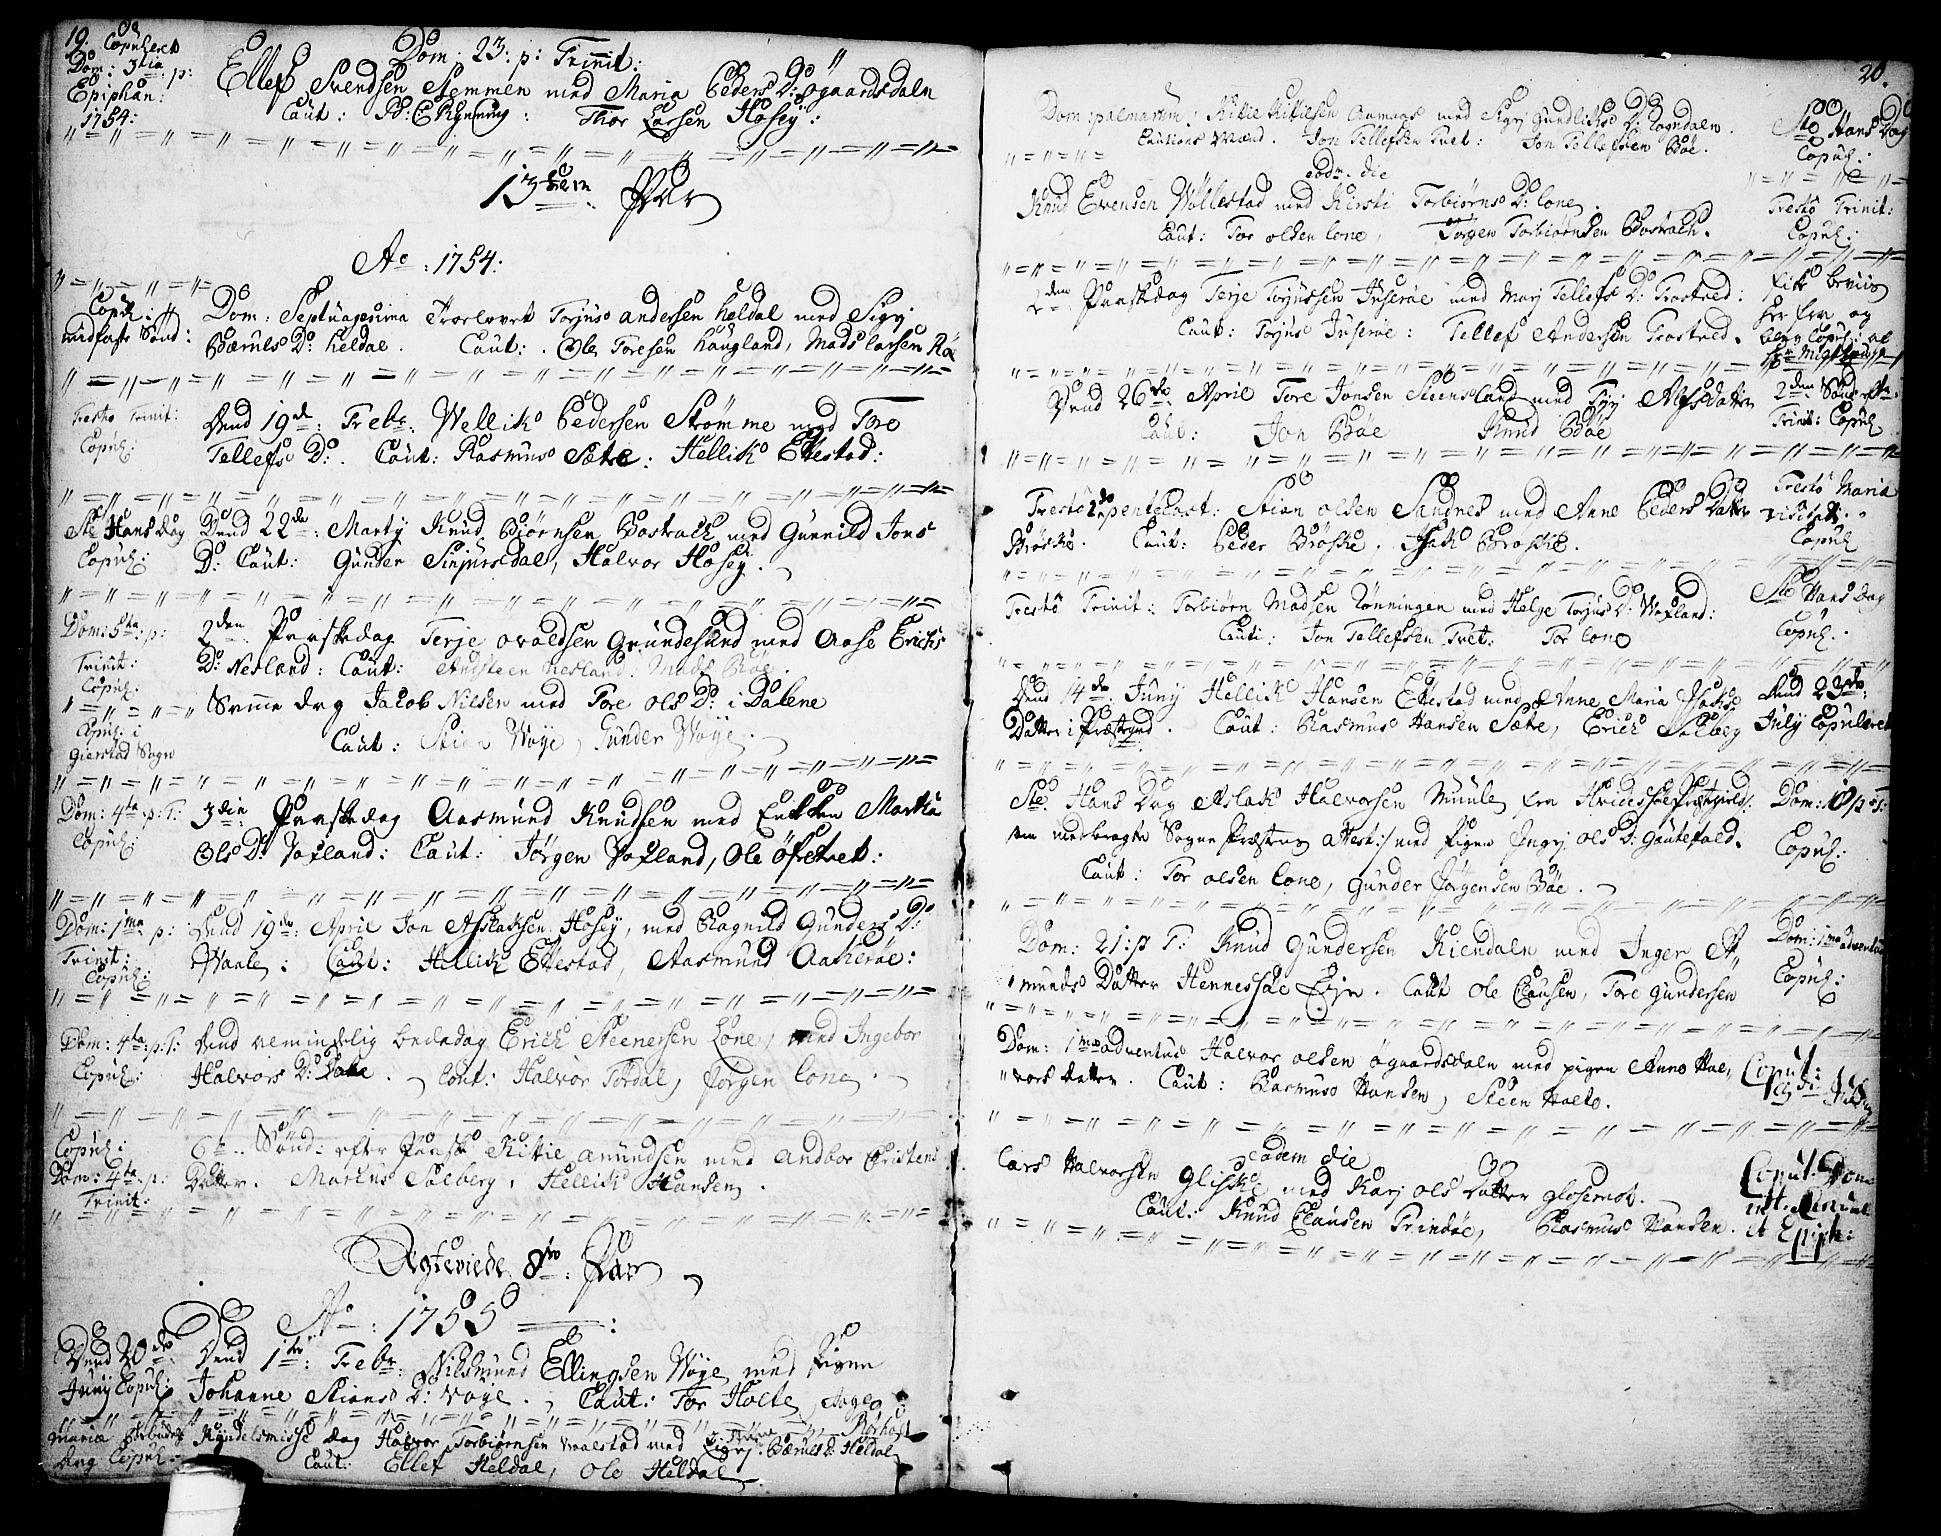 SAKO, Drangedal kirkebøker, F/Fa/L0001: Ministerialbok nr. 1, 1697-1767, s. 19-20